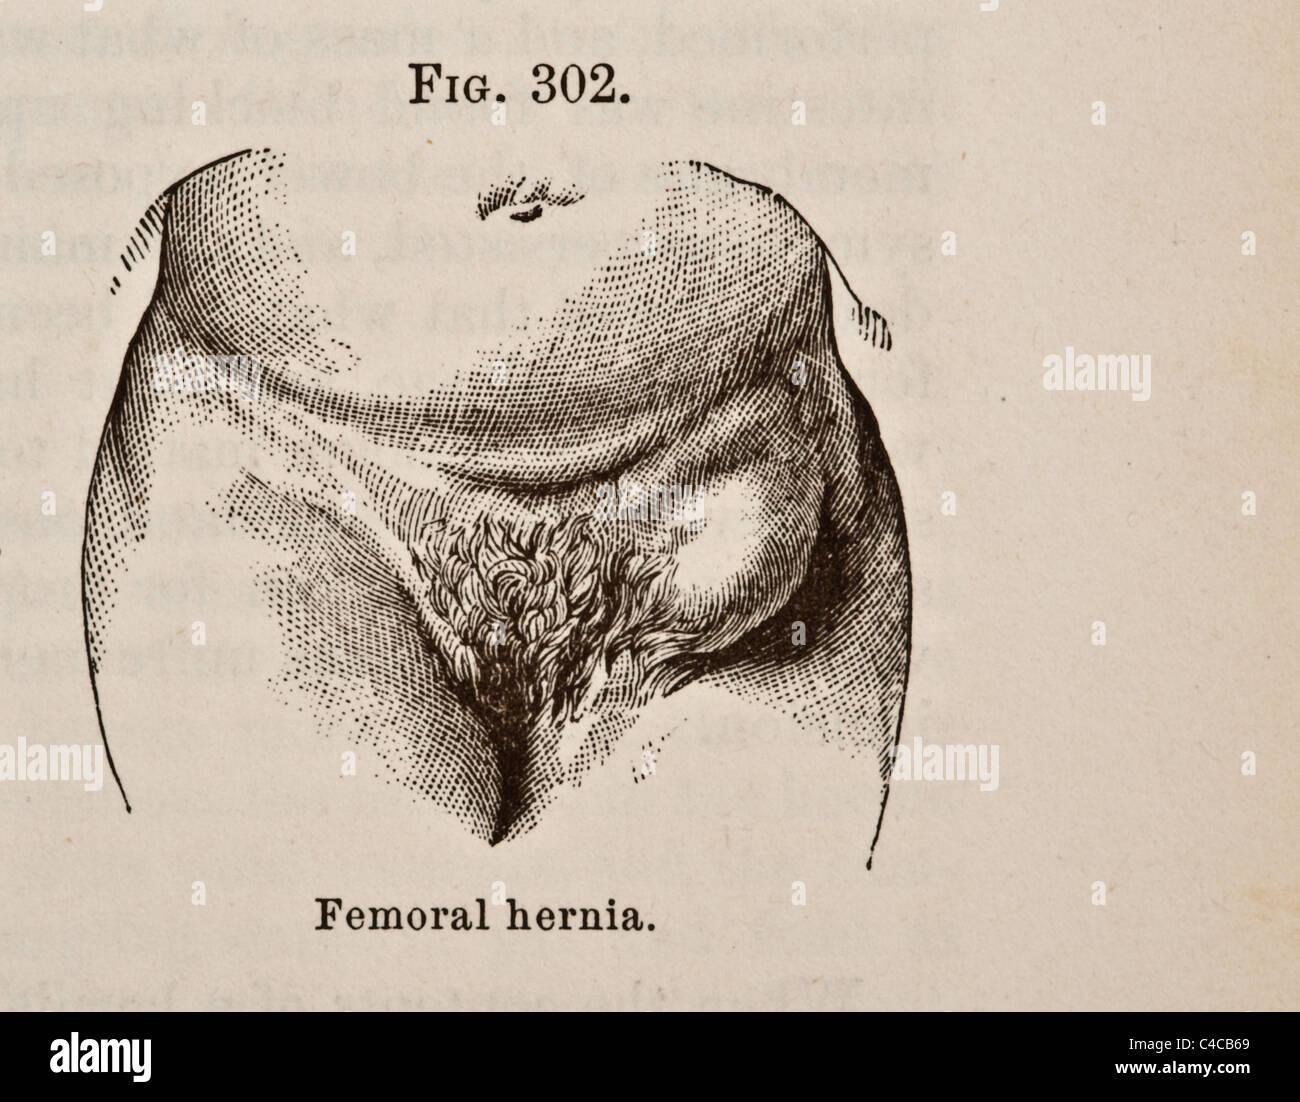 Antique Medical Illustration Depicting Hernia circa 1881 - Stock Image